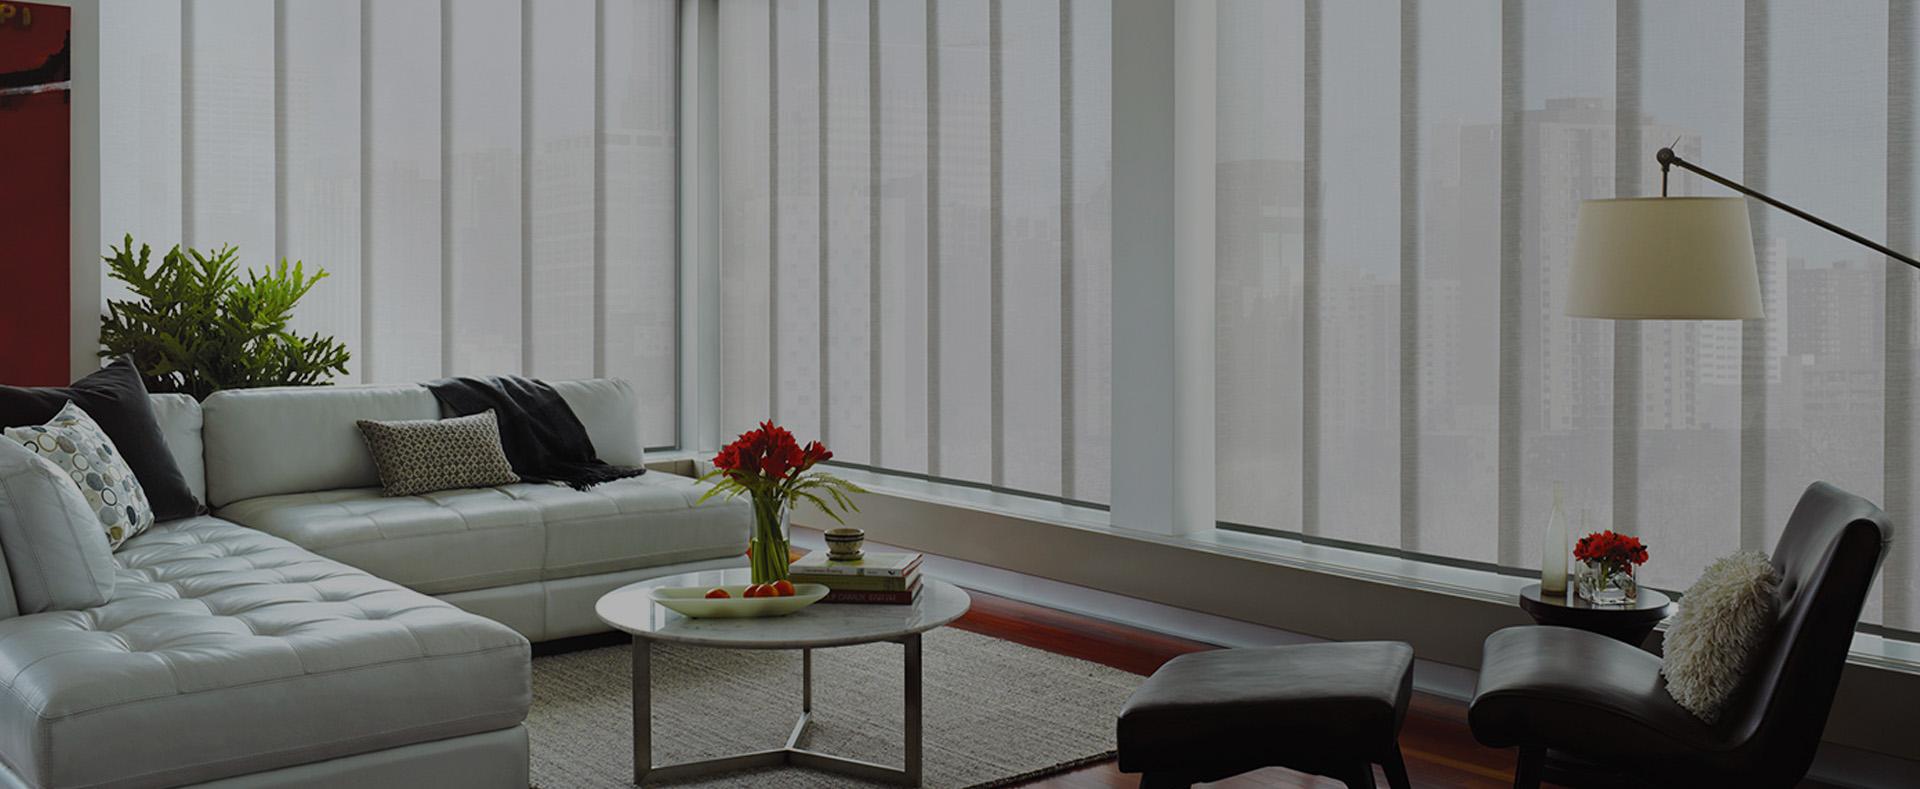 Skyline Shades Denmay Interiors Ltd